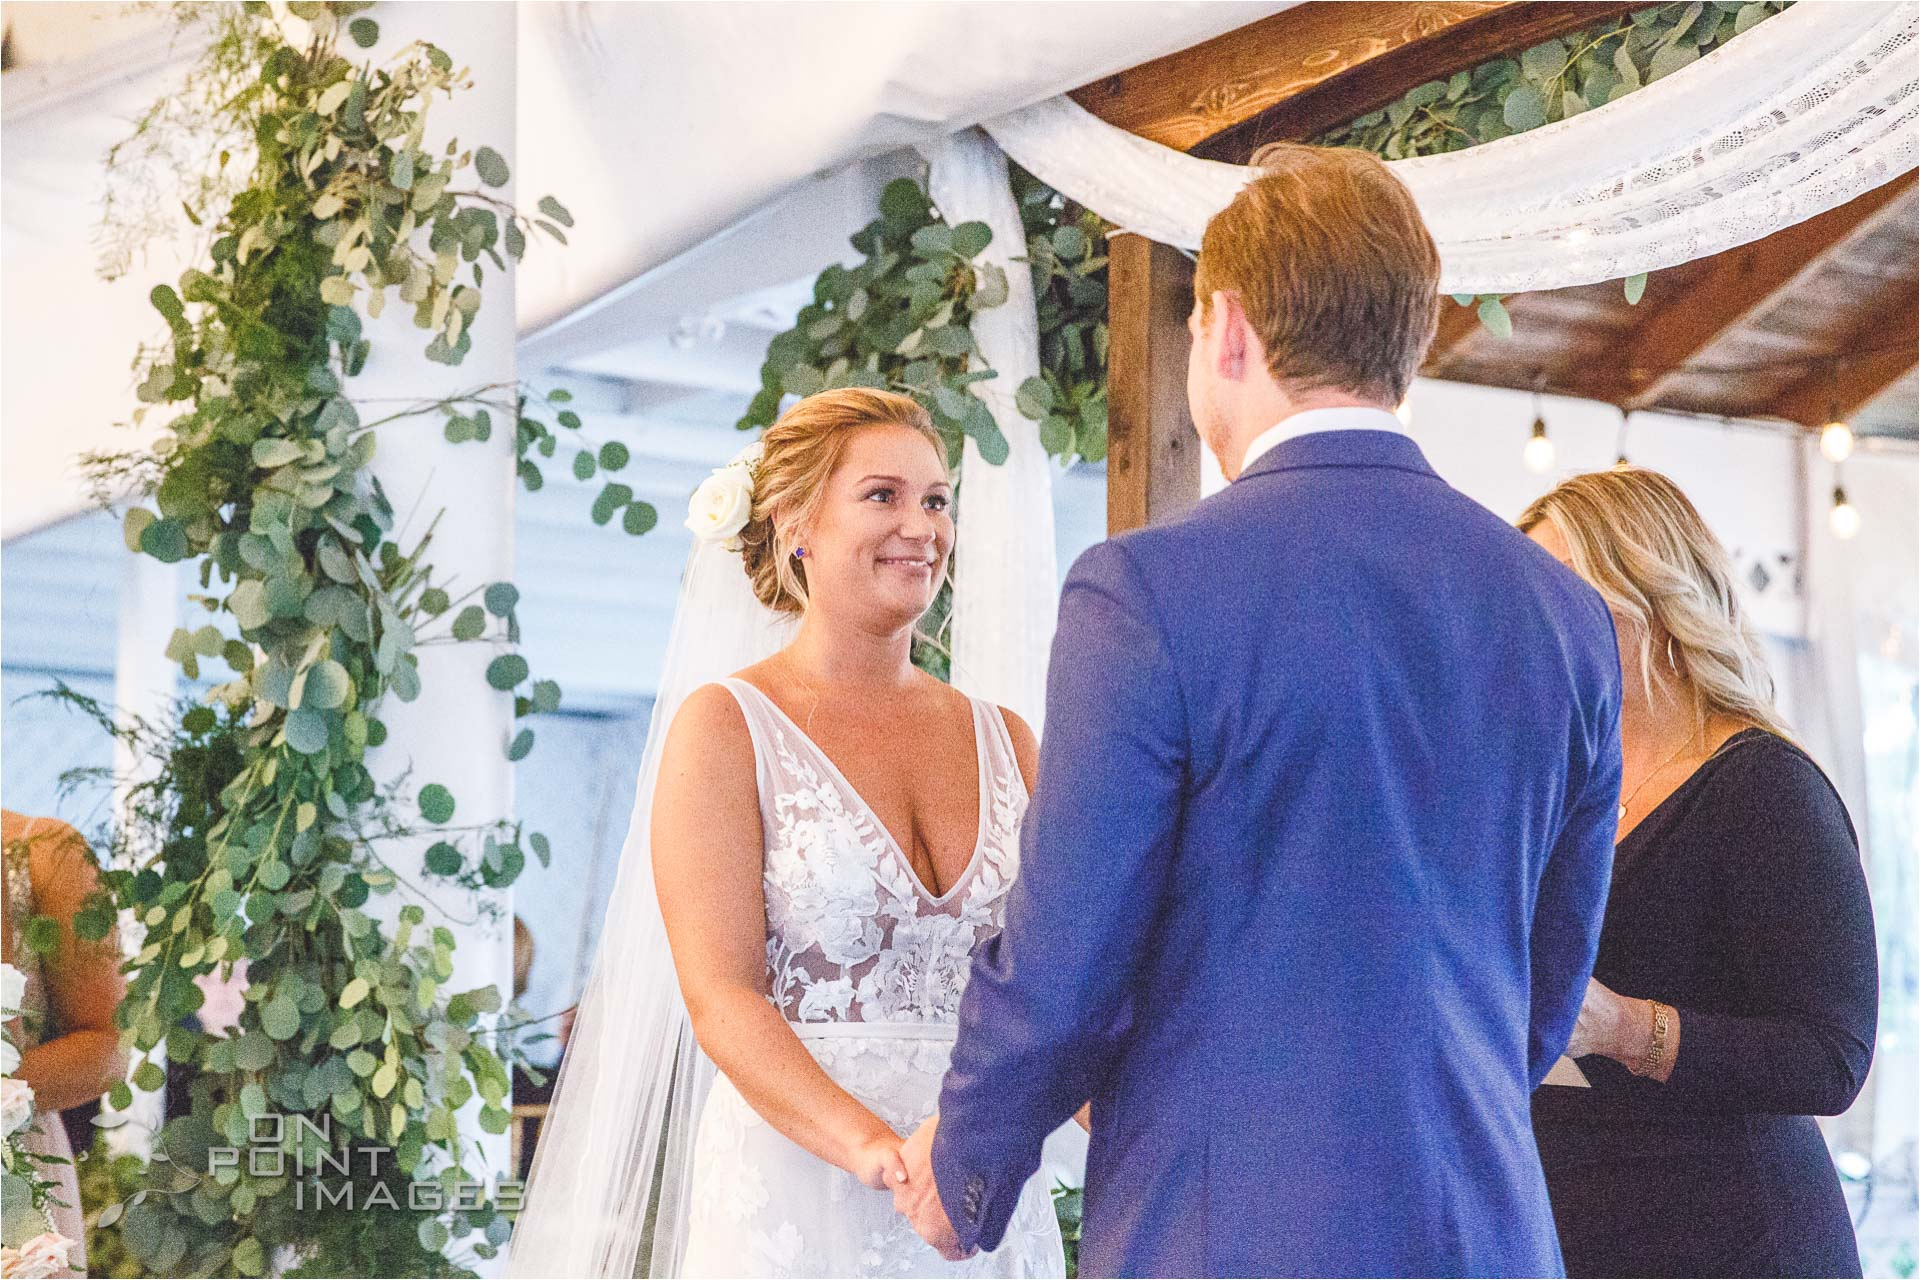 inn-at-mystic-wedding-photography-14.jpg